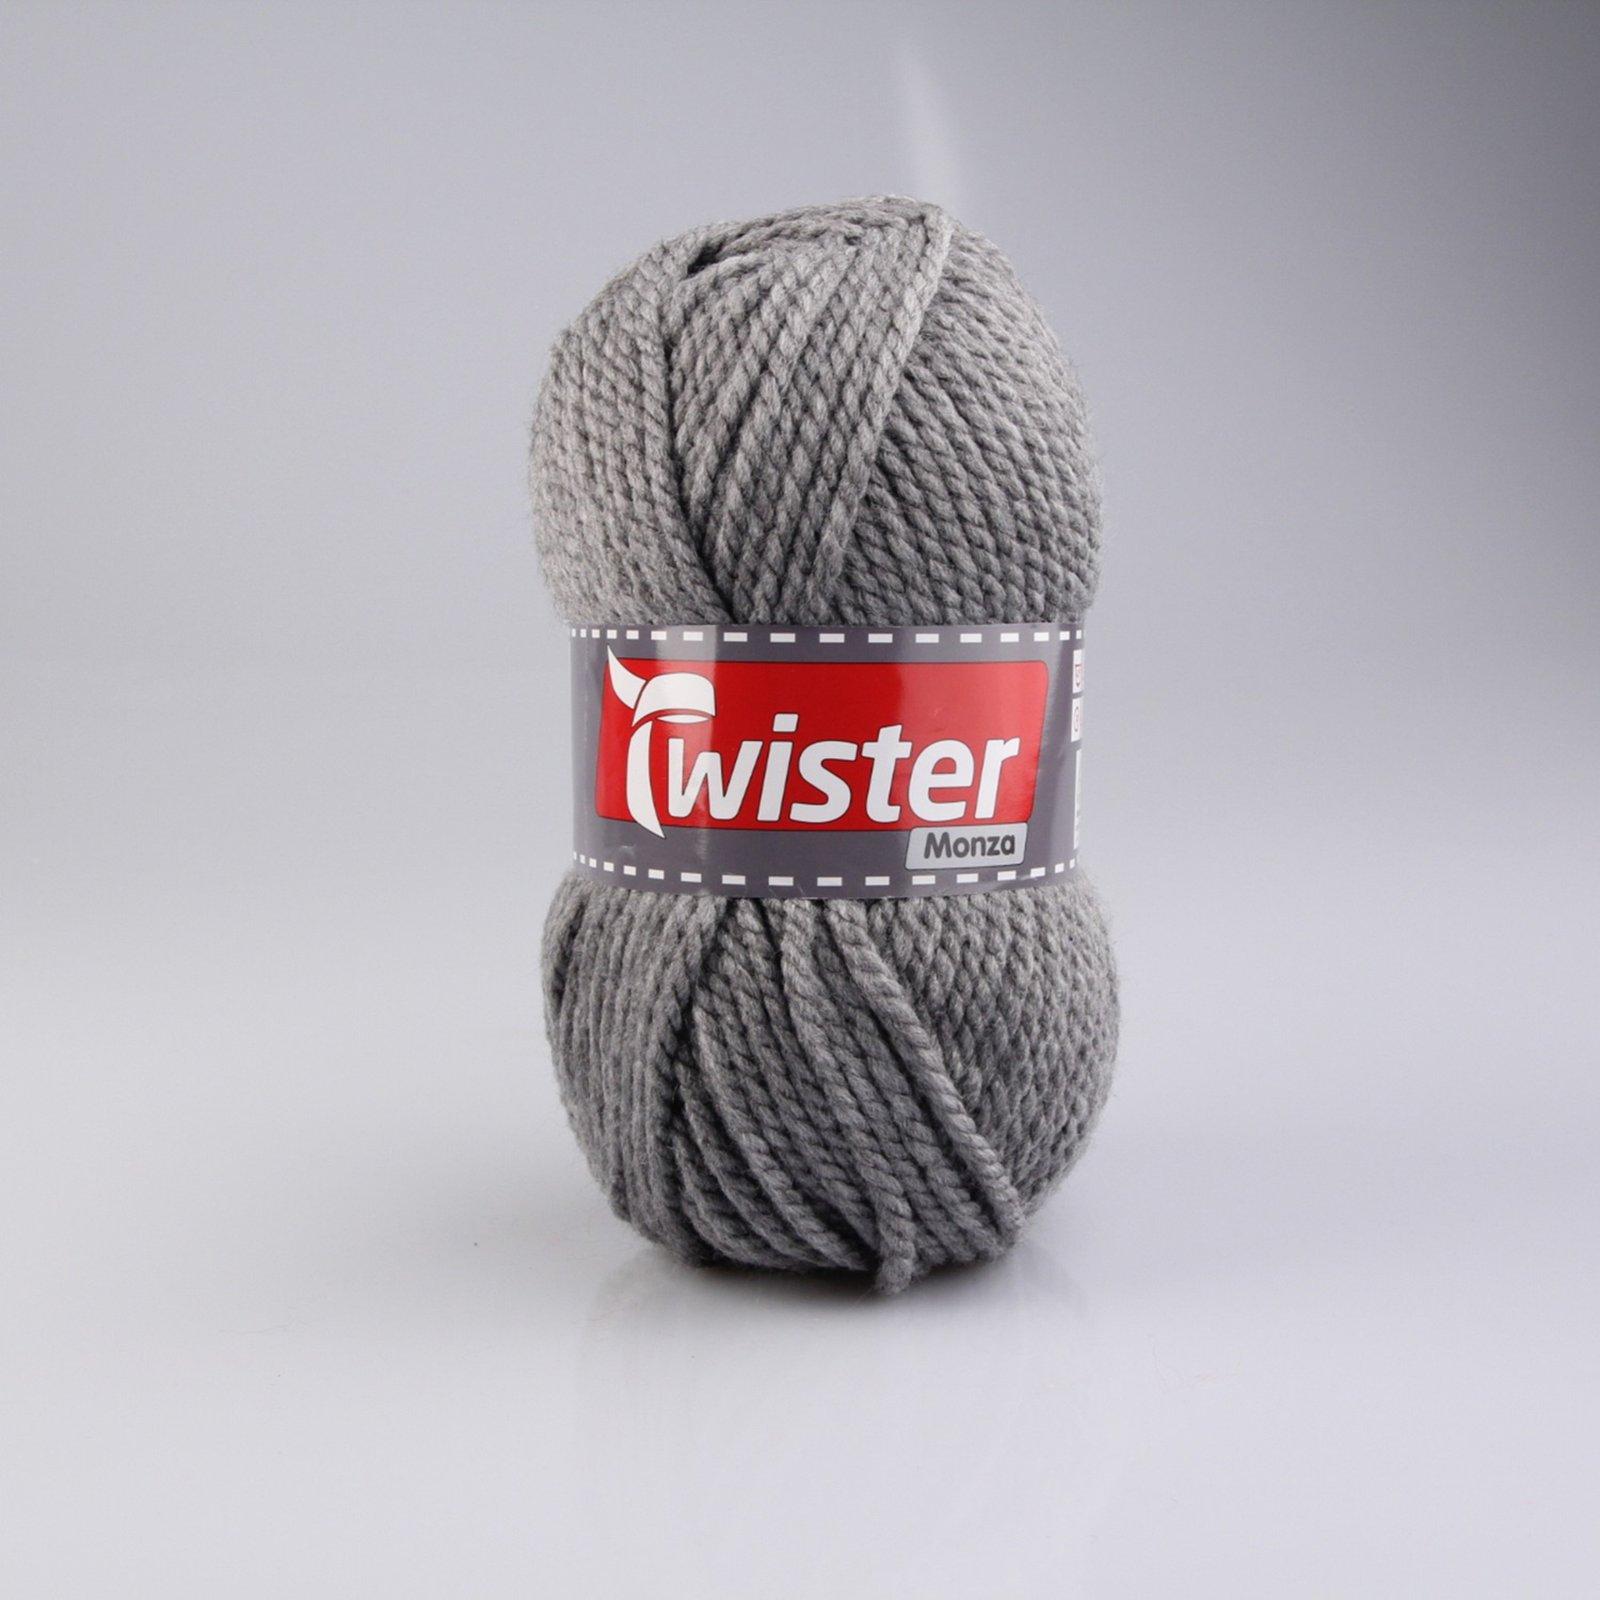 Wolle TWISTER MONZA - grau - 200g